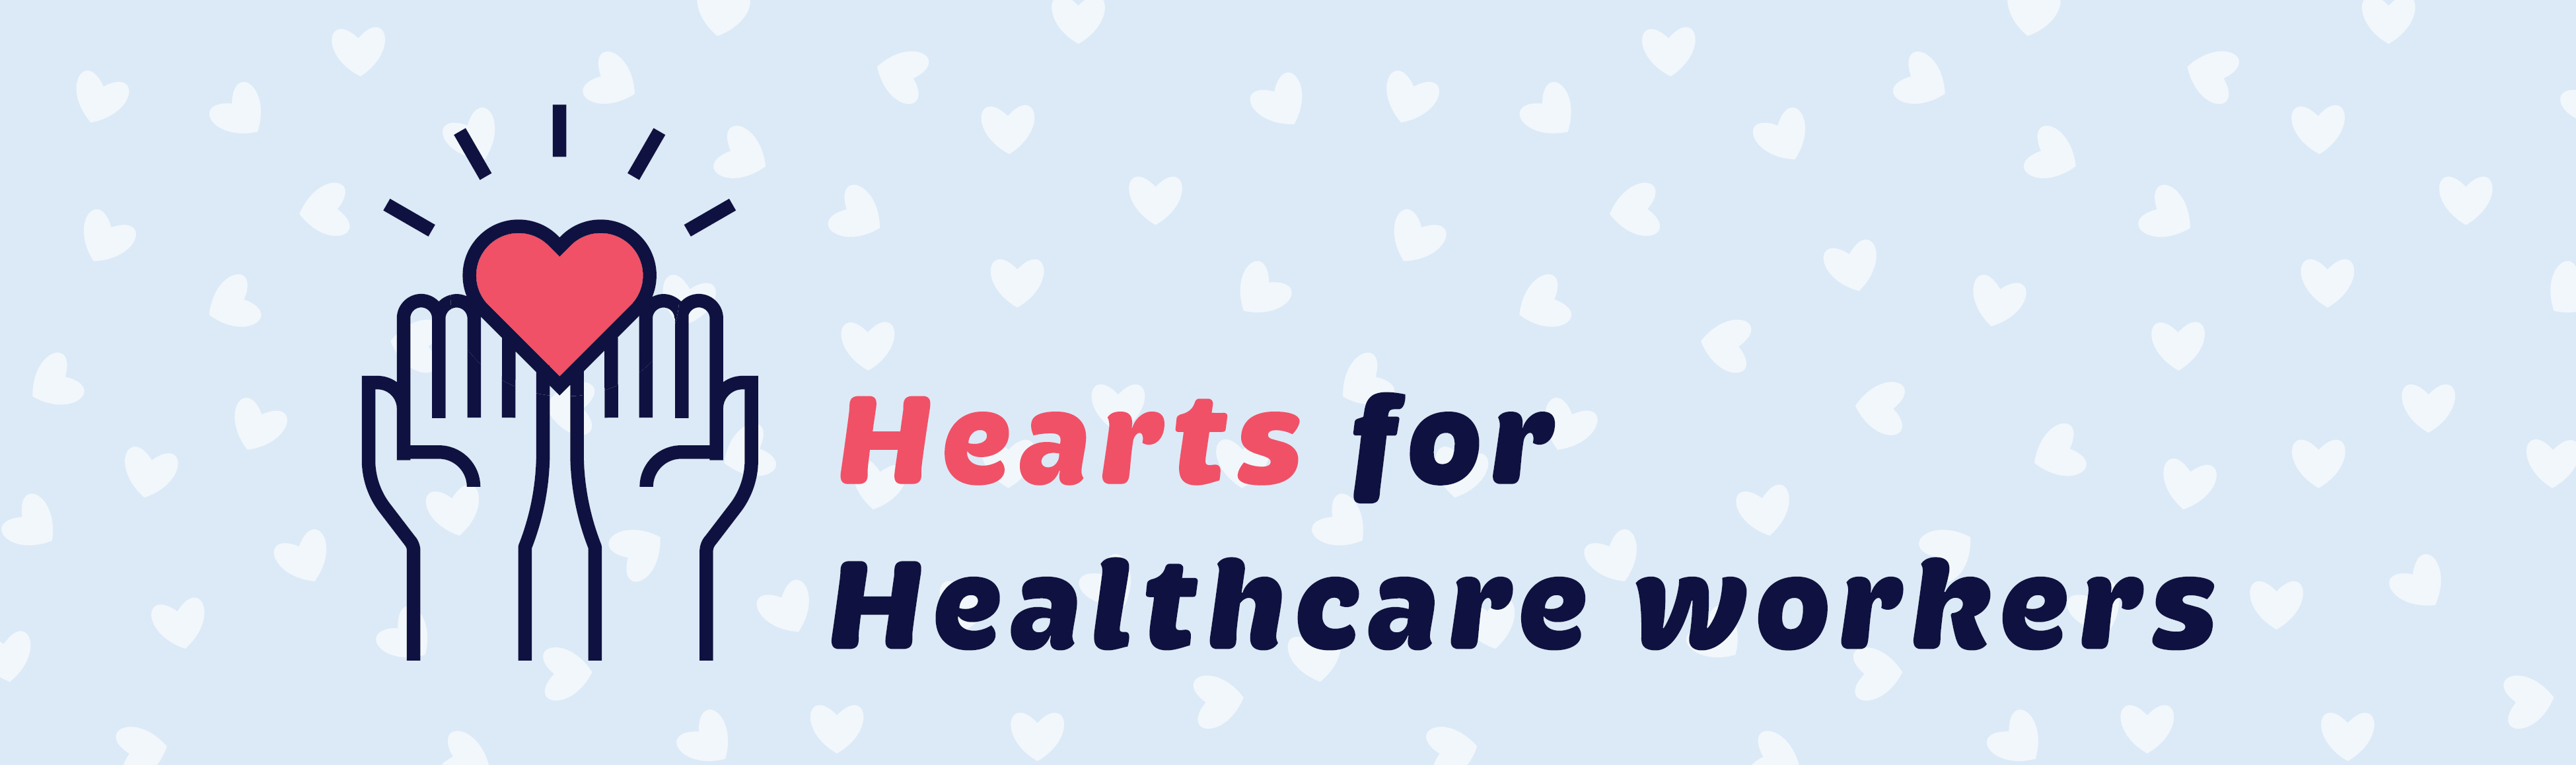 HeartsforHealthcareWEB1